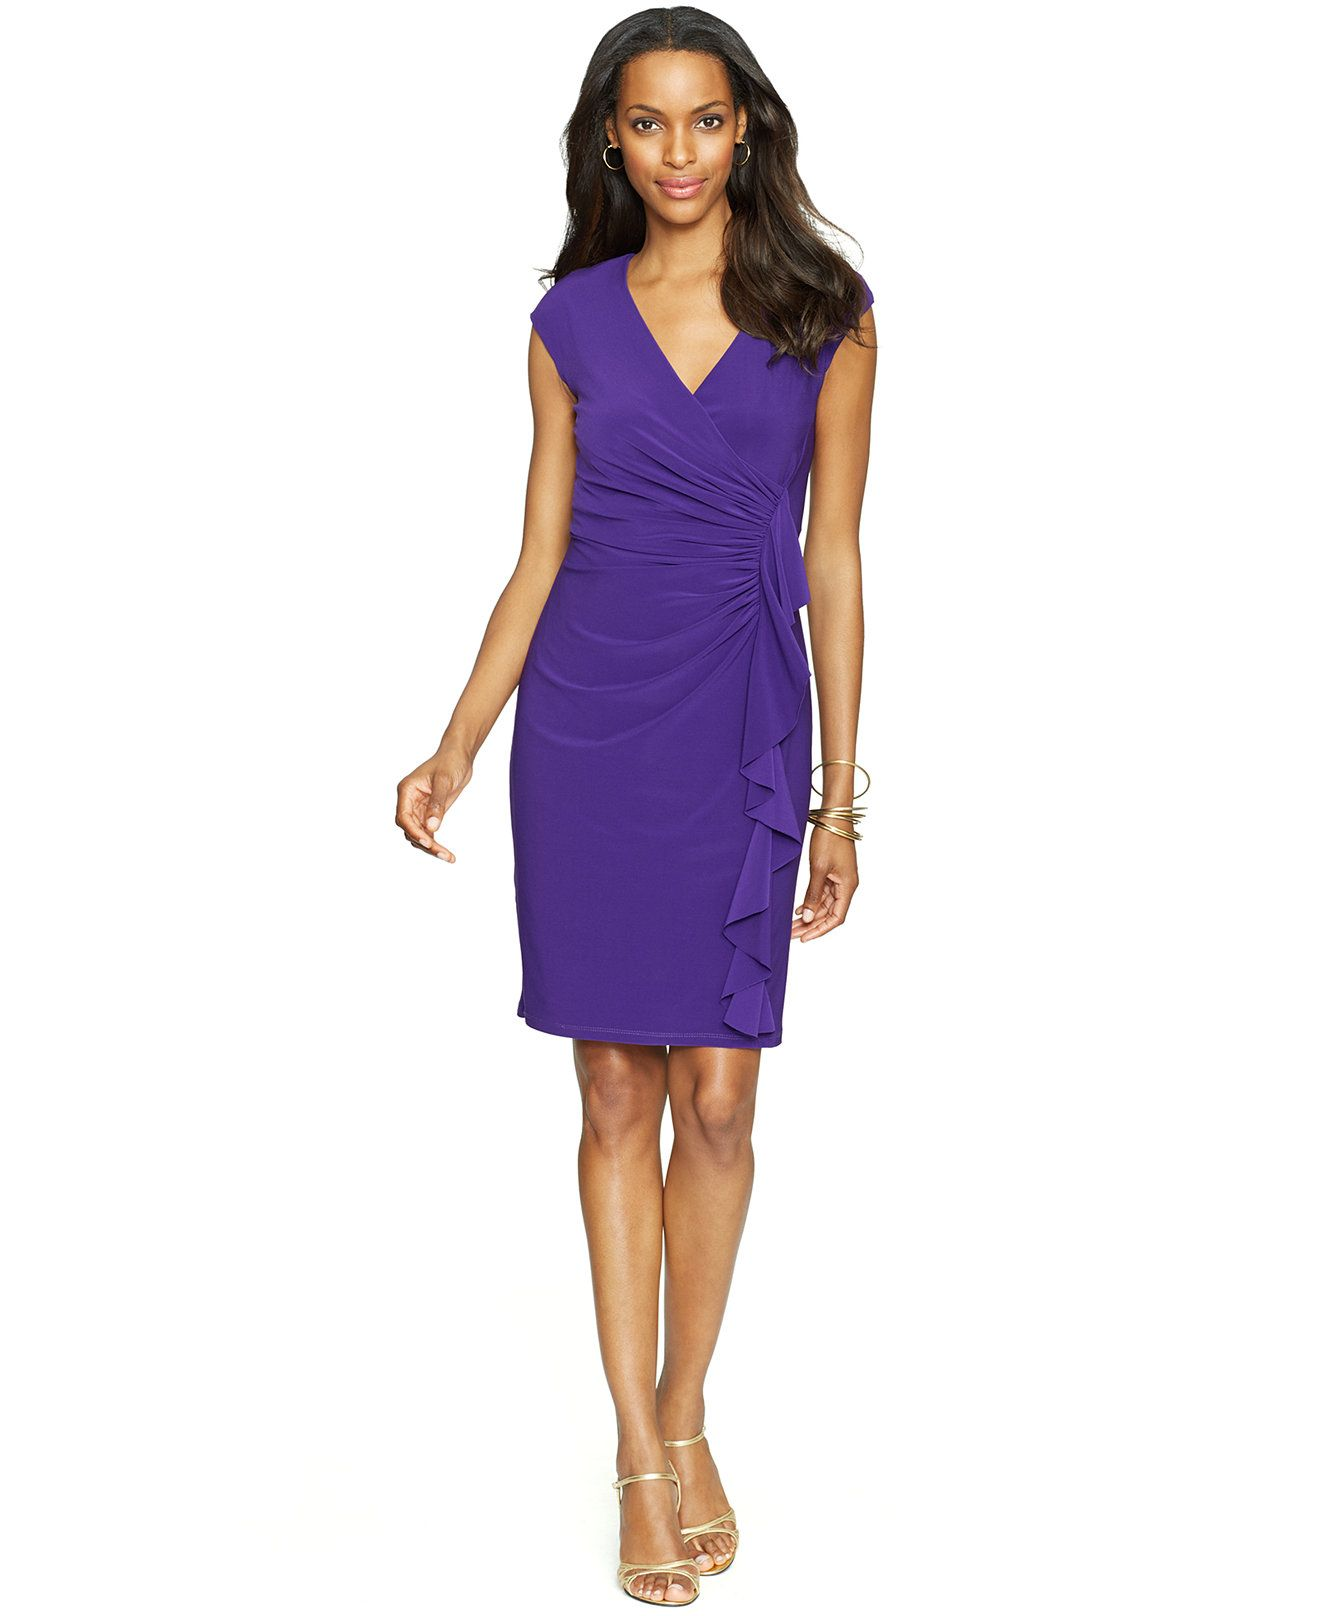 macy\'s purple dress american living - Google Search | Orlando city ...